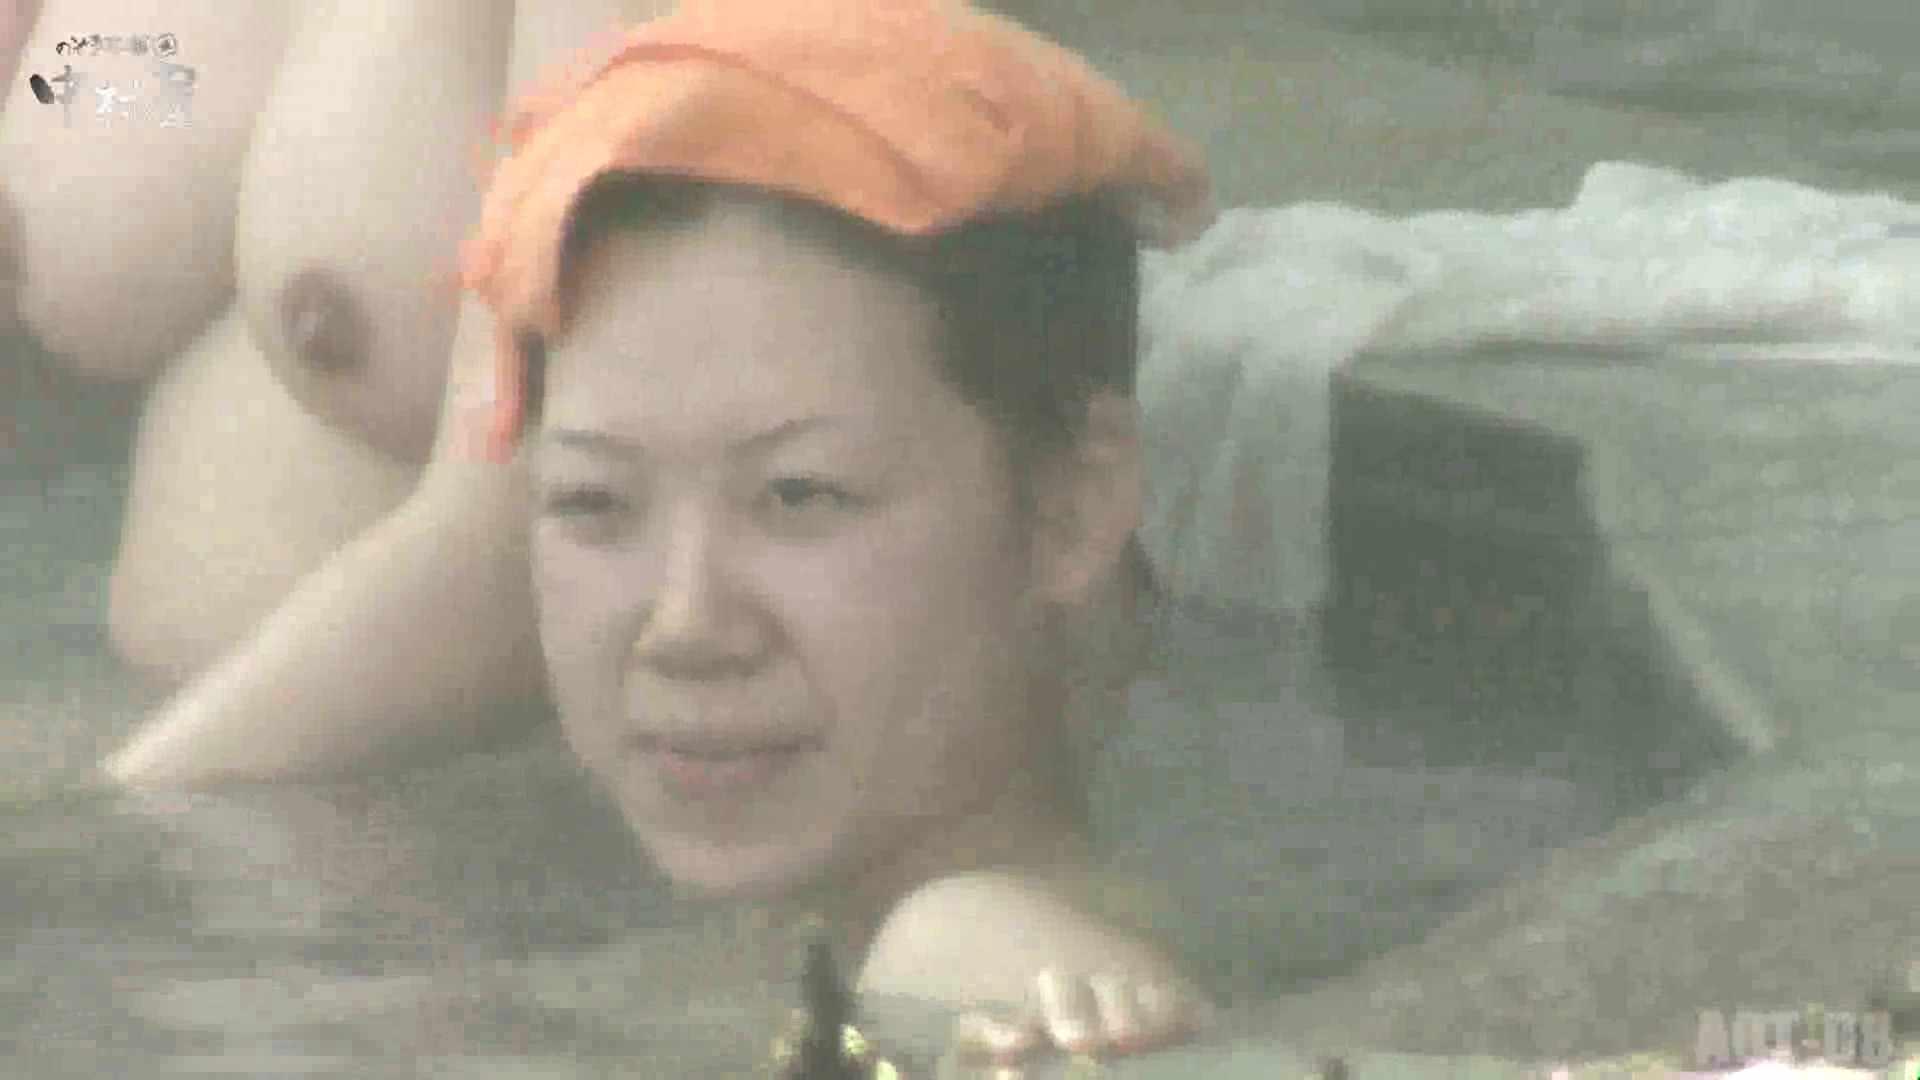 Aquaな露天風呂Vol.872潜入盗撮露天風呂八判湯 其の六 盗撮シリーズ | 潜入  102PIX 79